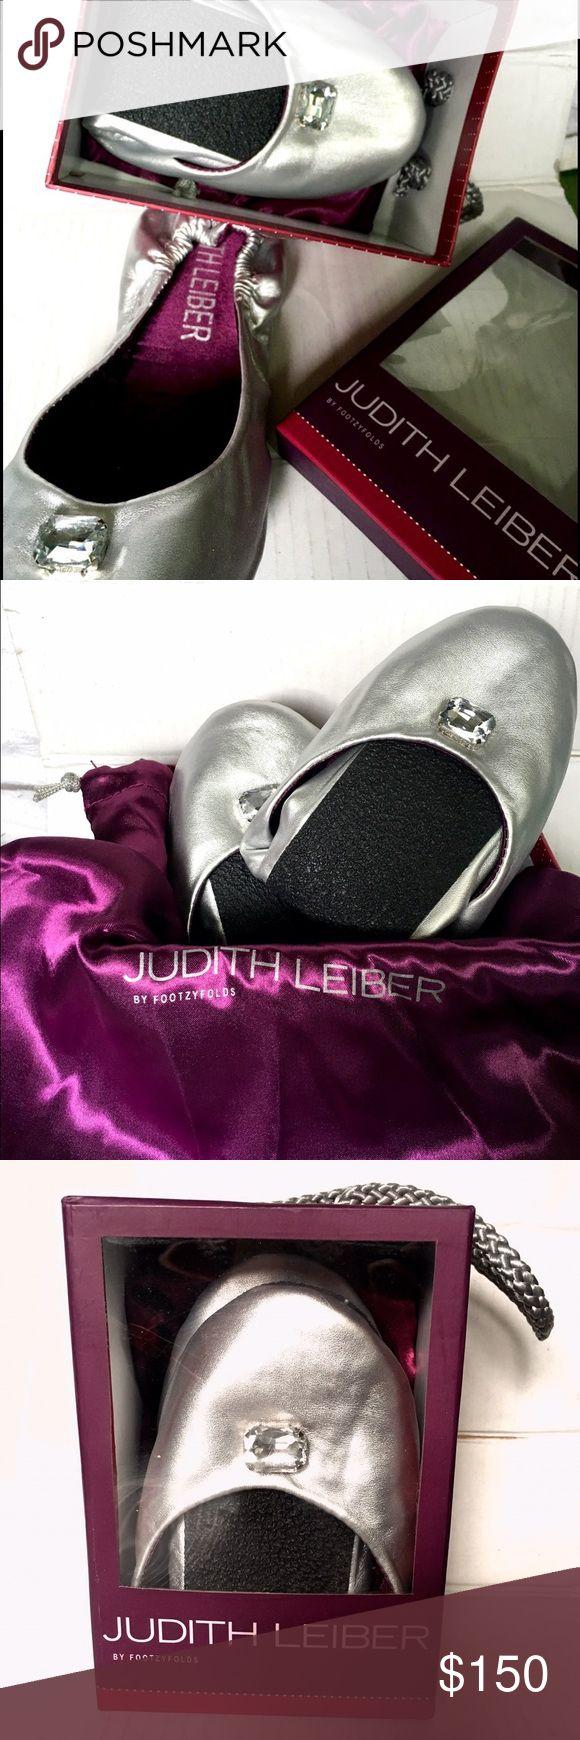 Selling this JUDITH LEIBER Silver Foldable Ballet Flat M7.5/8.5 on Poshmark! My username is: nyccoco. #shopmycloset #poshmark #fashion #shopping #style #forsale #JUDITH LEIBER #Shoes